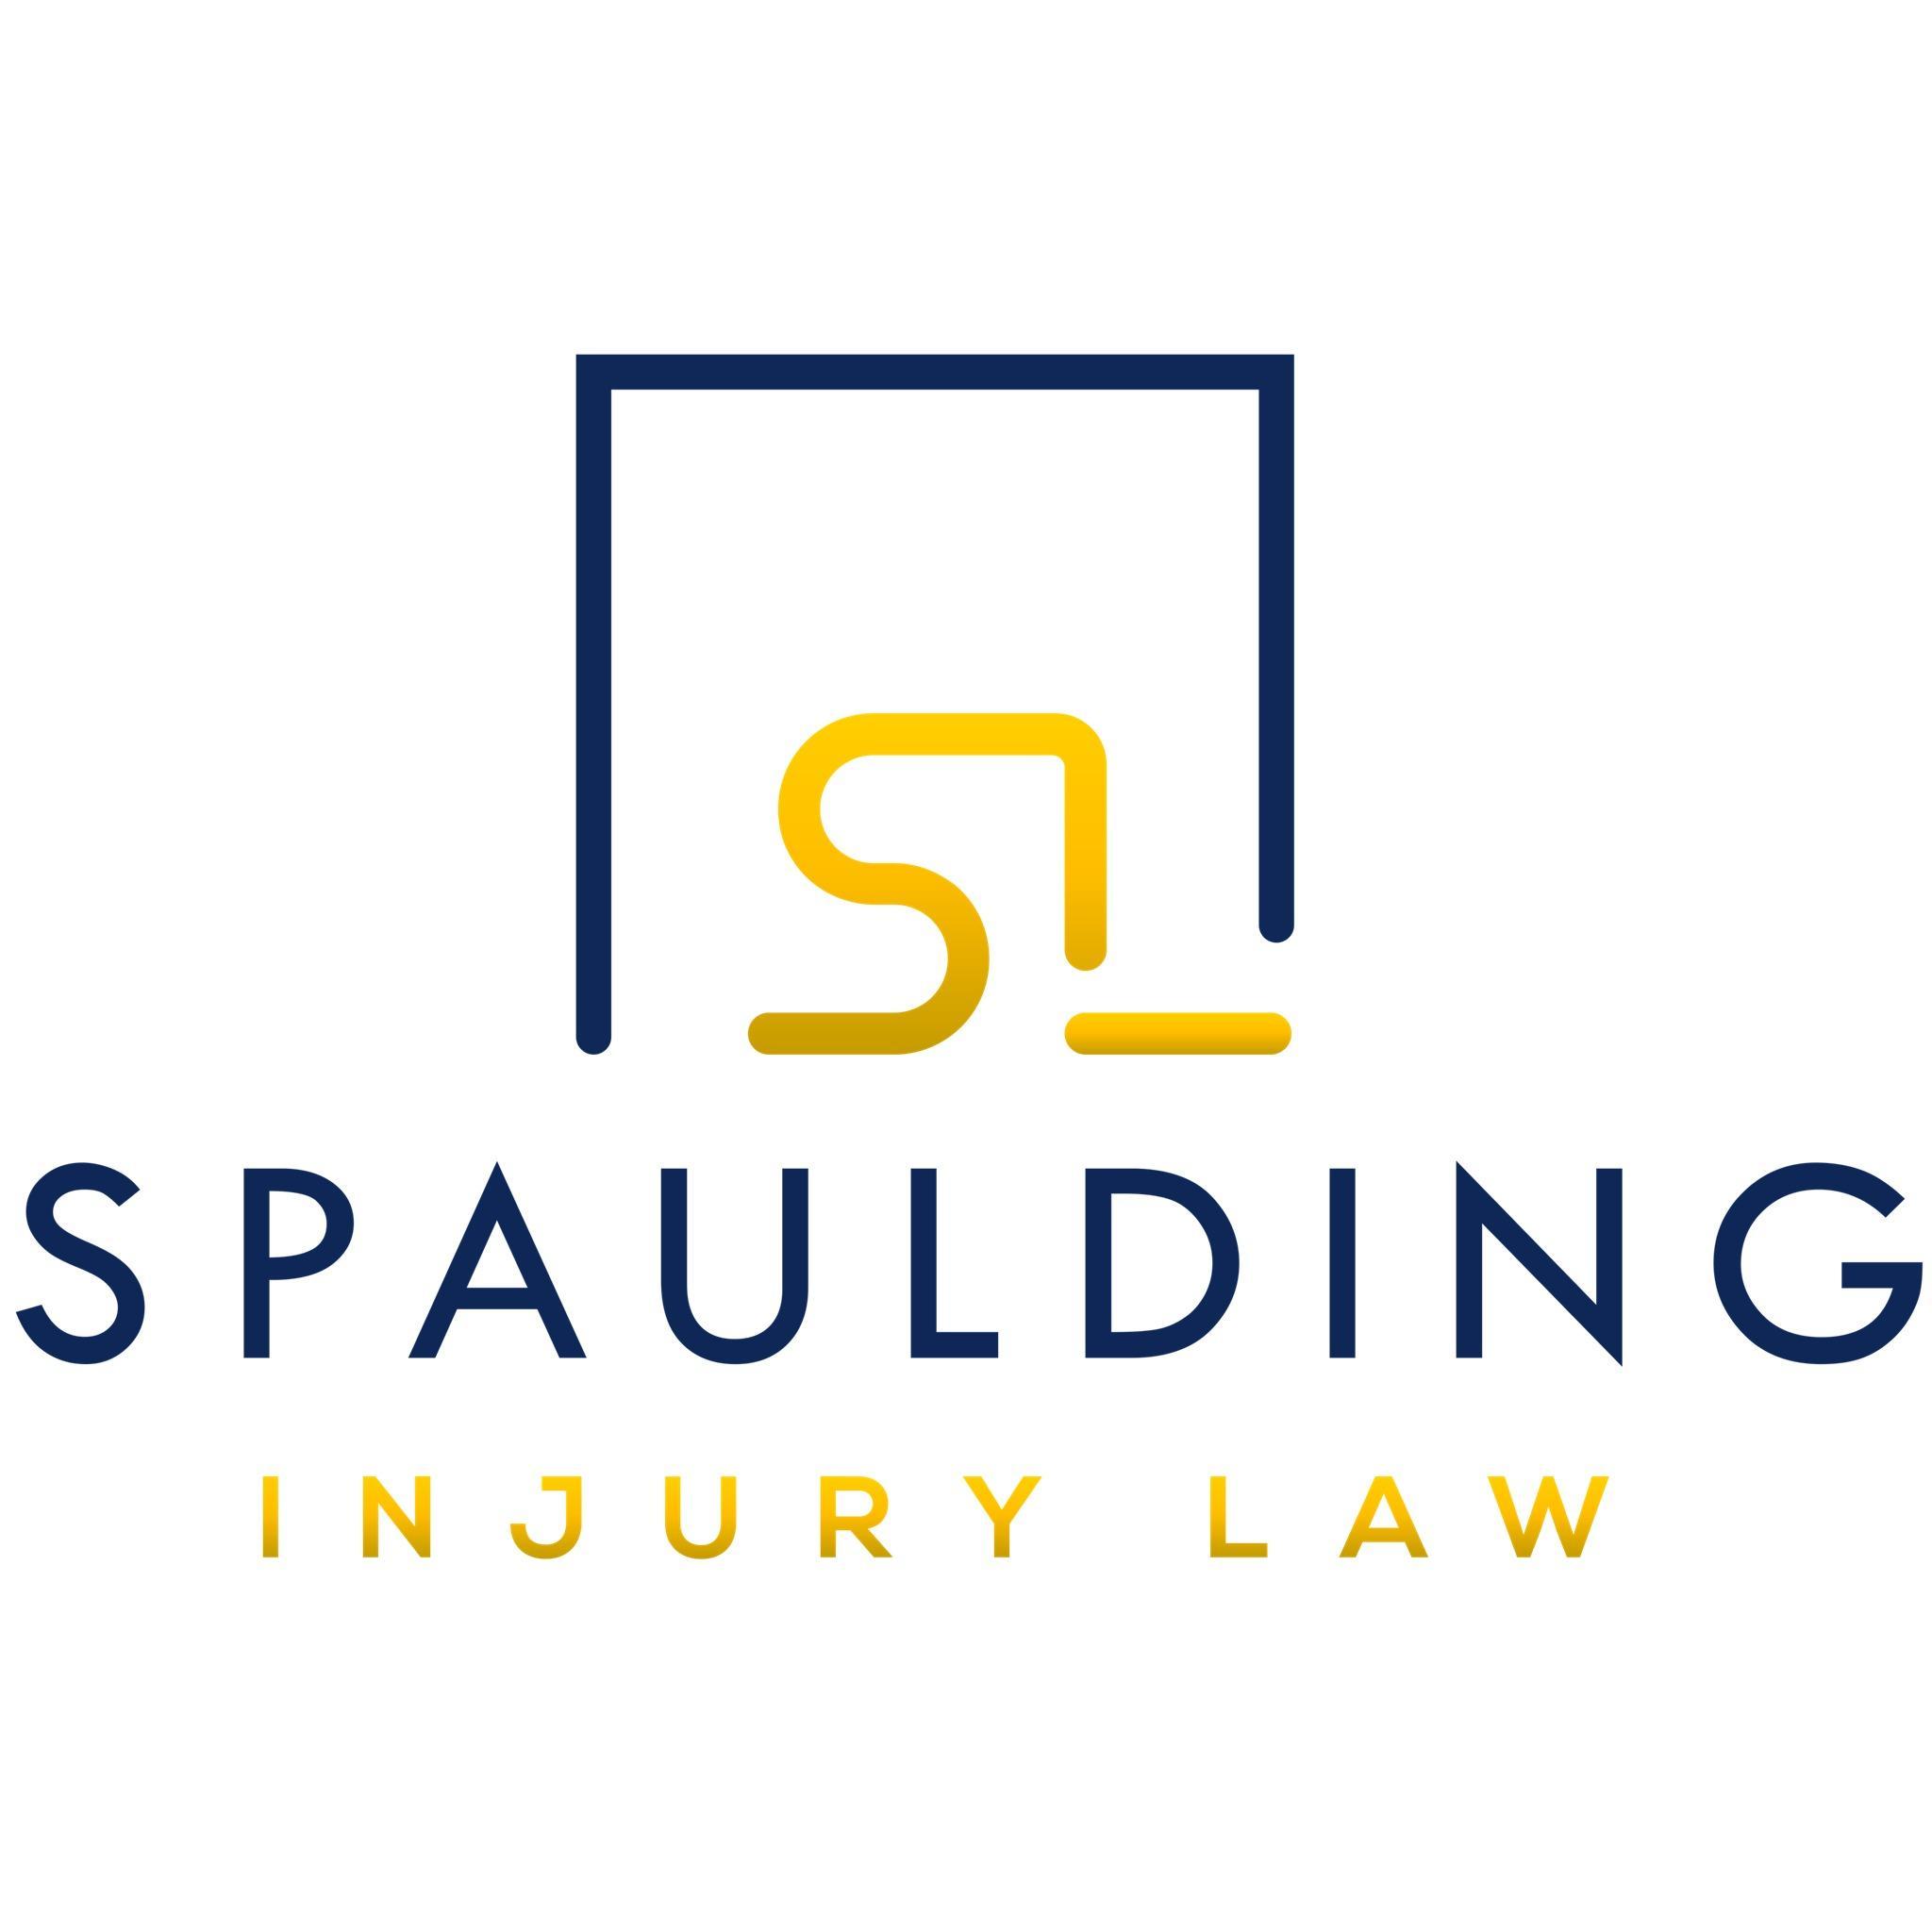 Spaulding Injury Law: Atlanta Personal Injury Lawyers